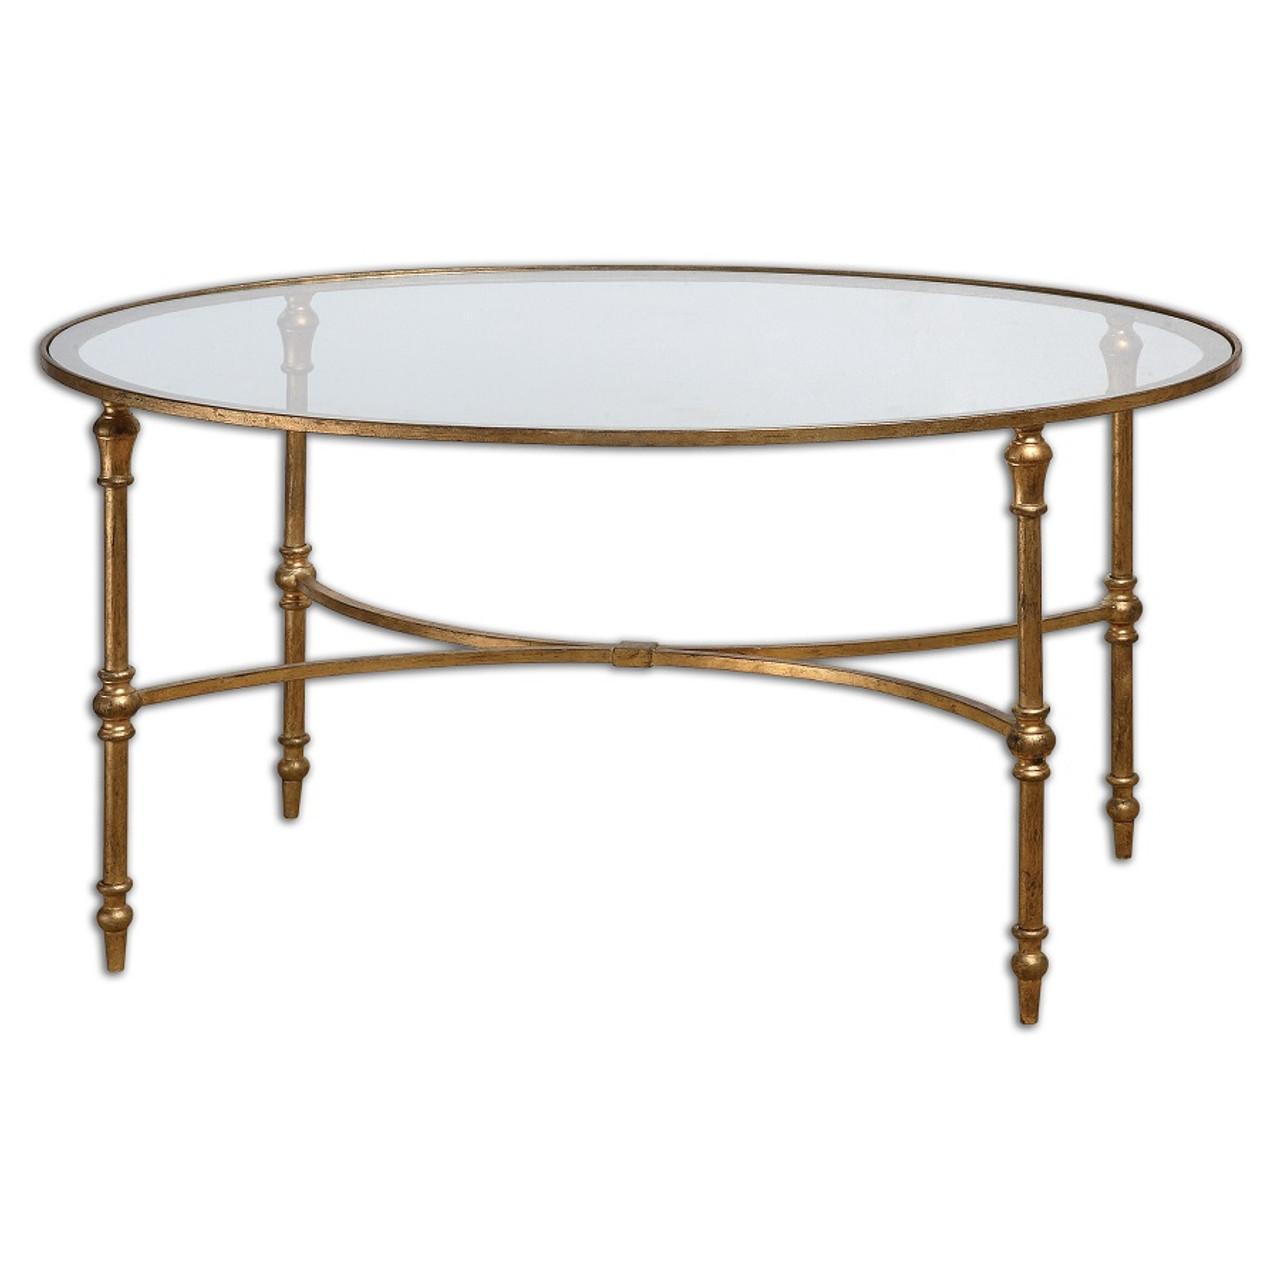 Vitya Gold Leaf Oval Glass Coffee Table Zin Home